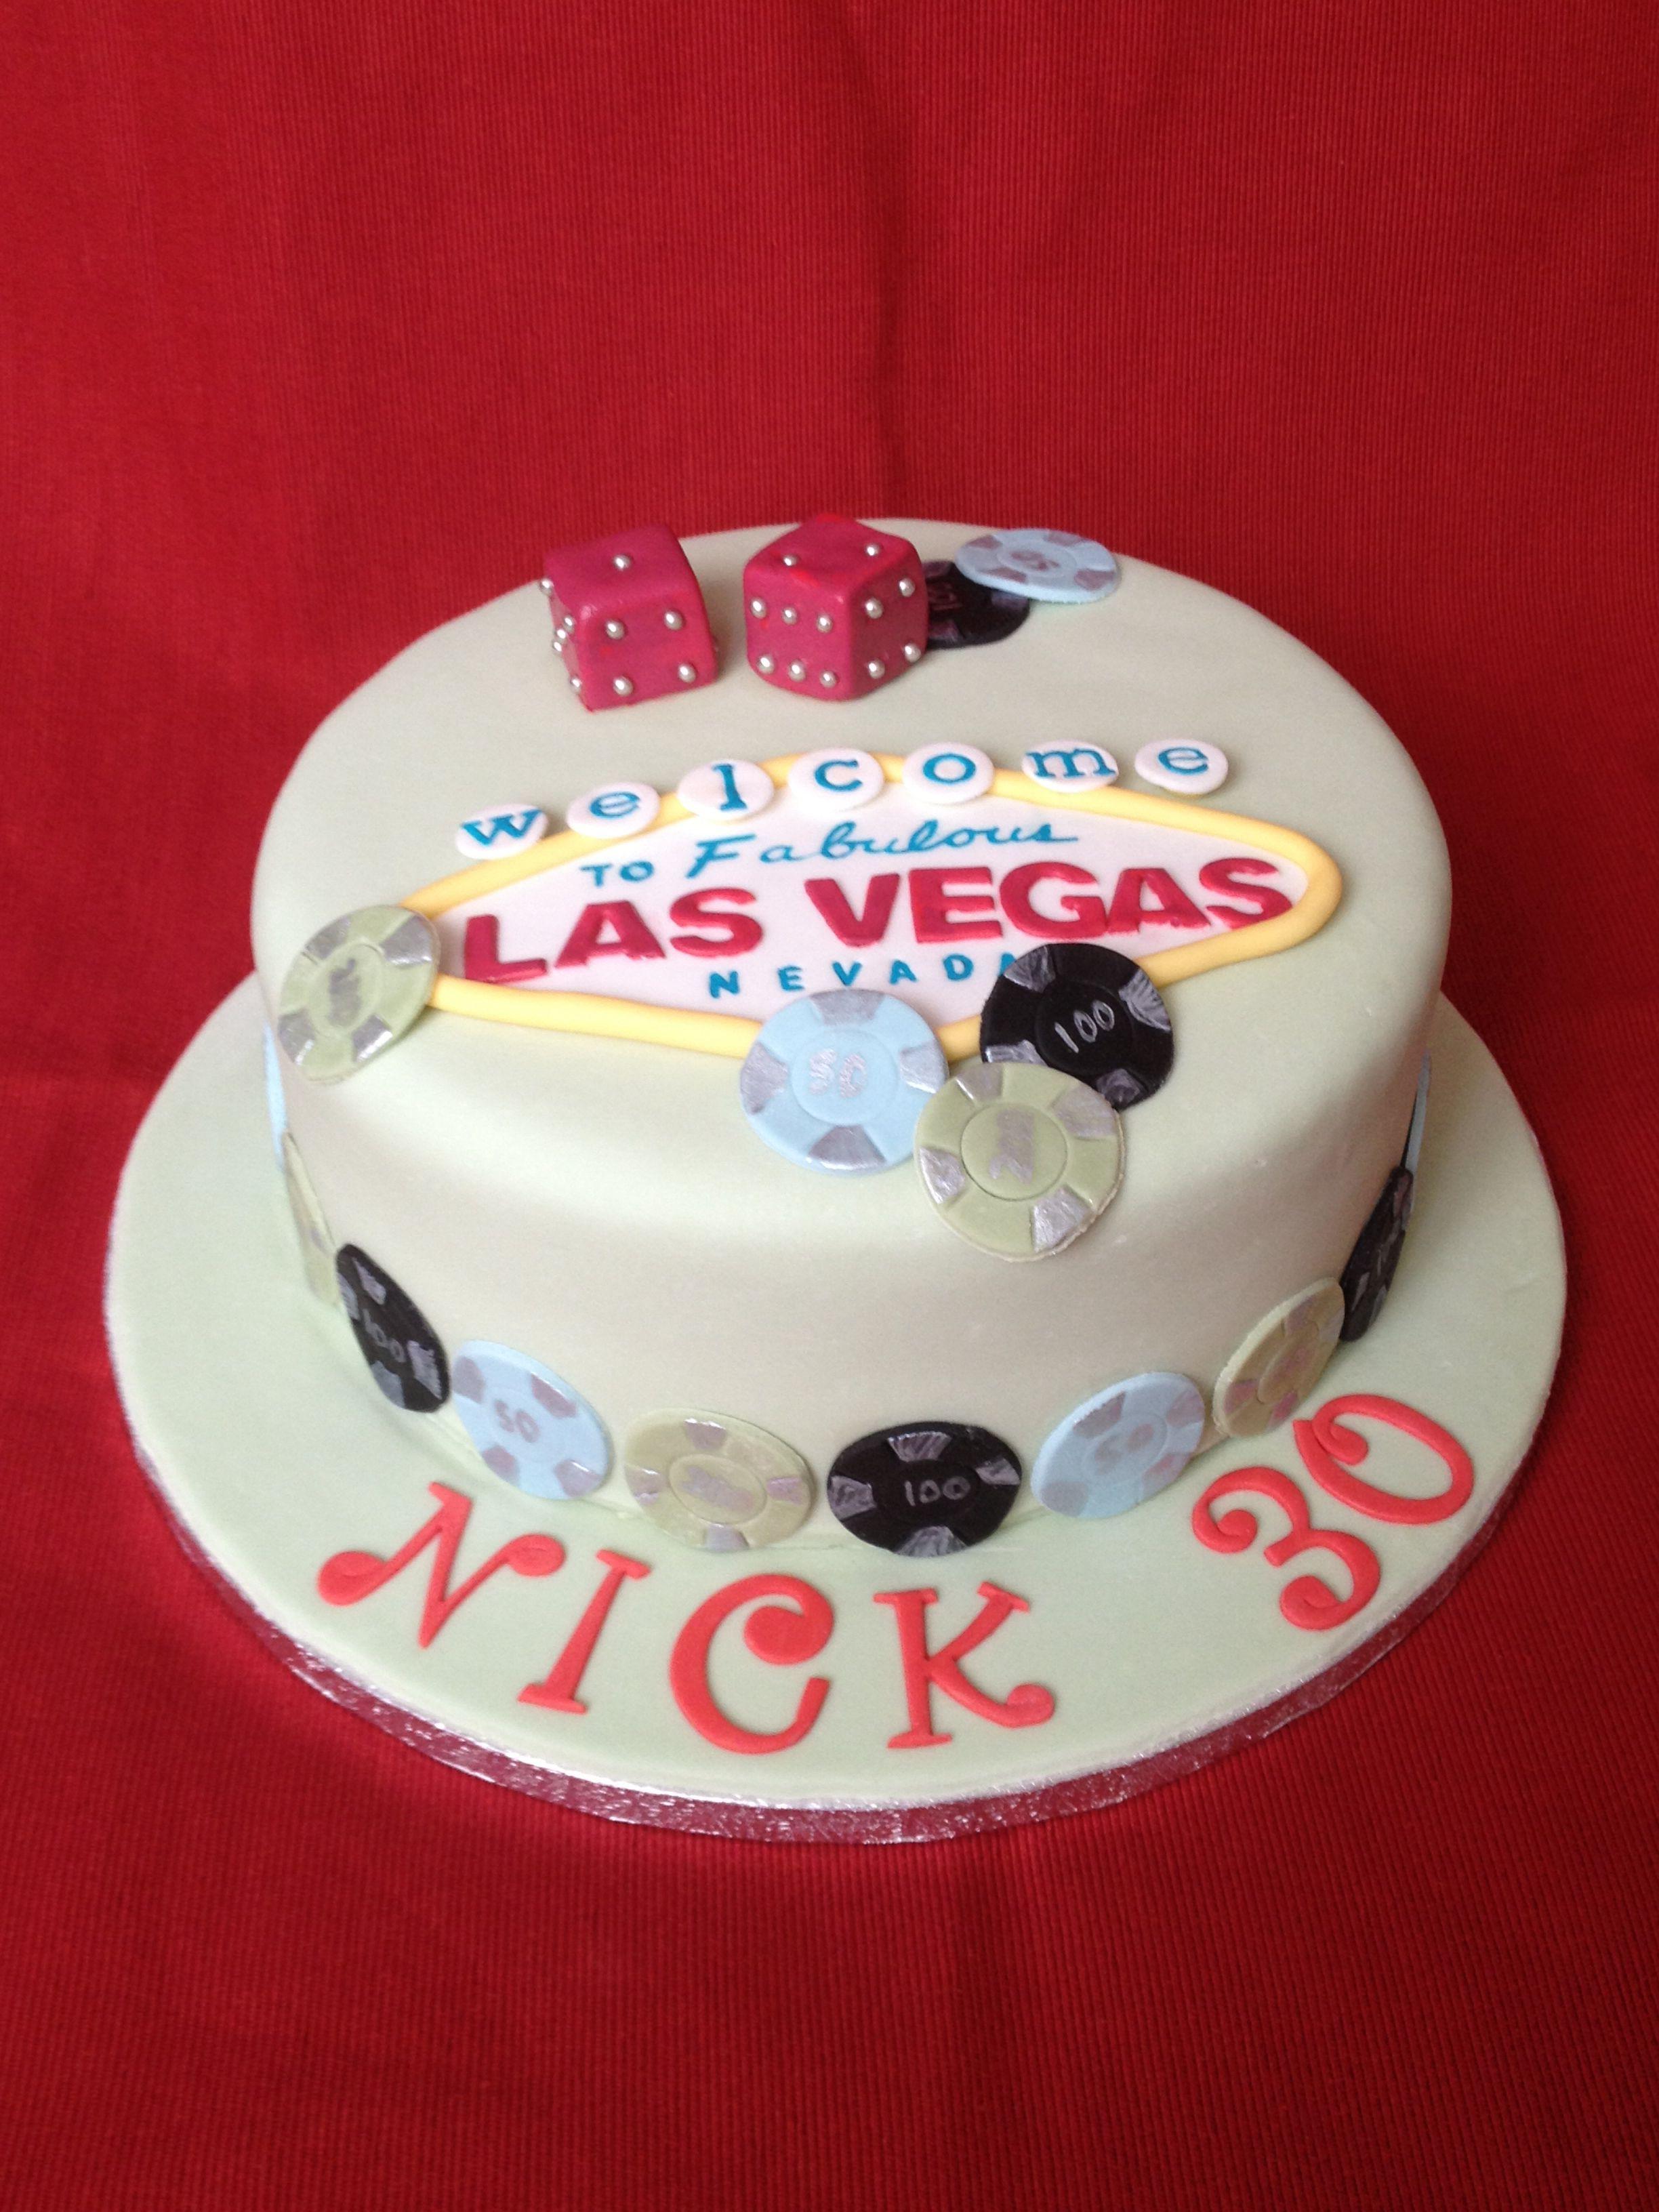 Las vegas cake vegas cake las vegas cake cake